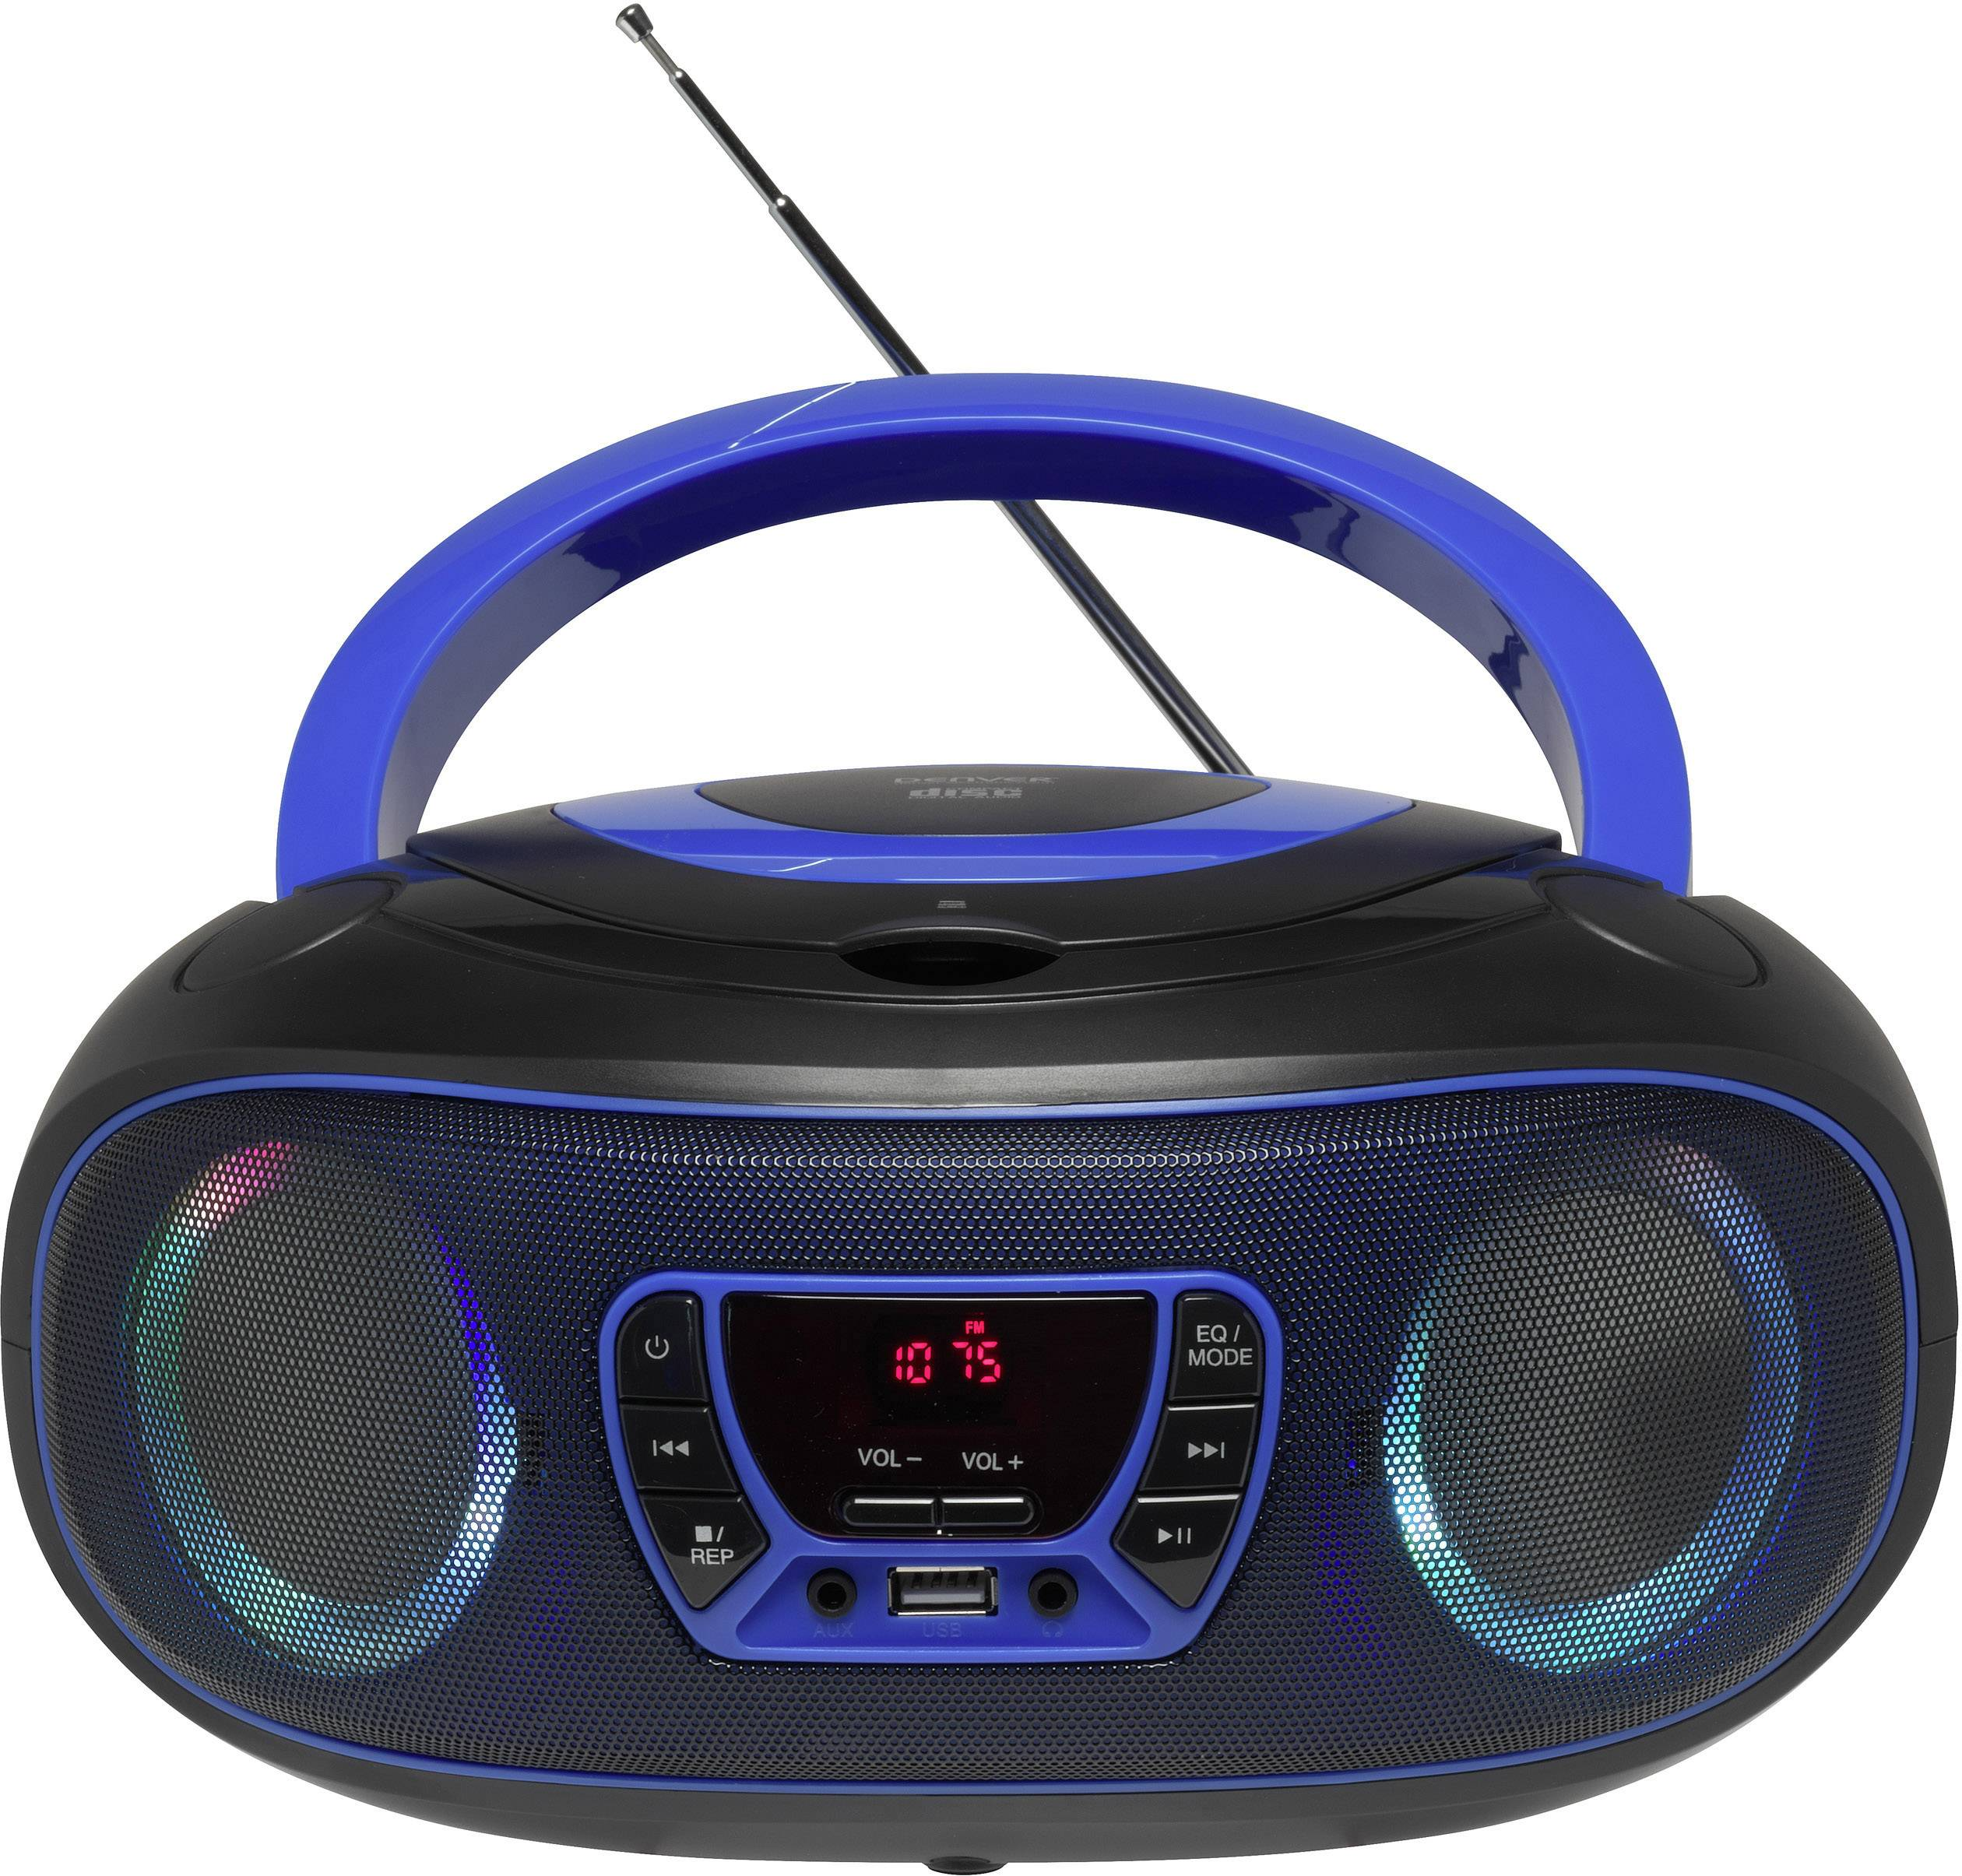 Top Denver TCL-212BT FM CD-radio AUX, CD, USB, Bluetooth YO02